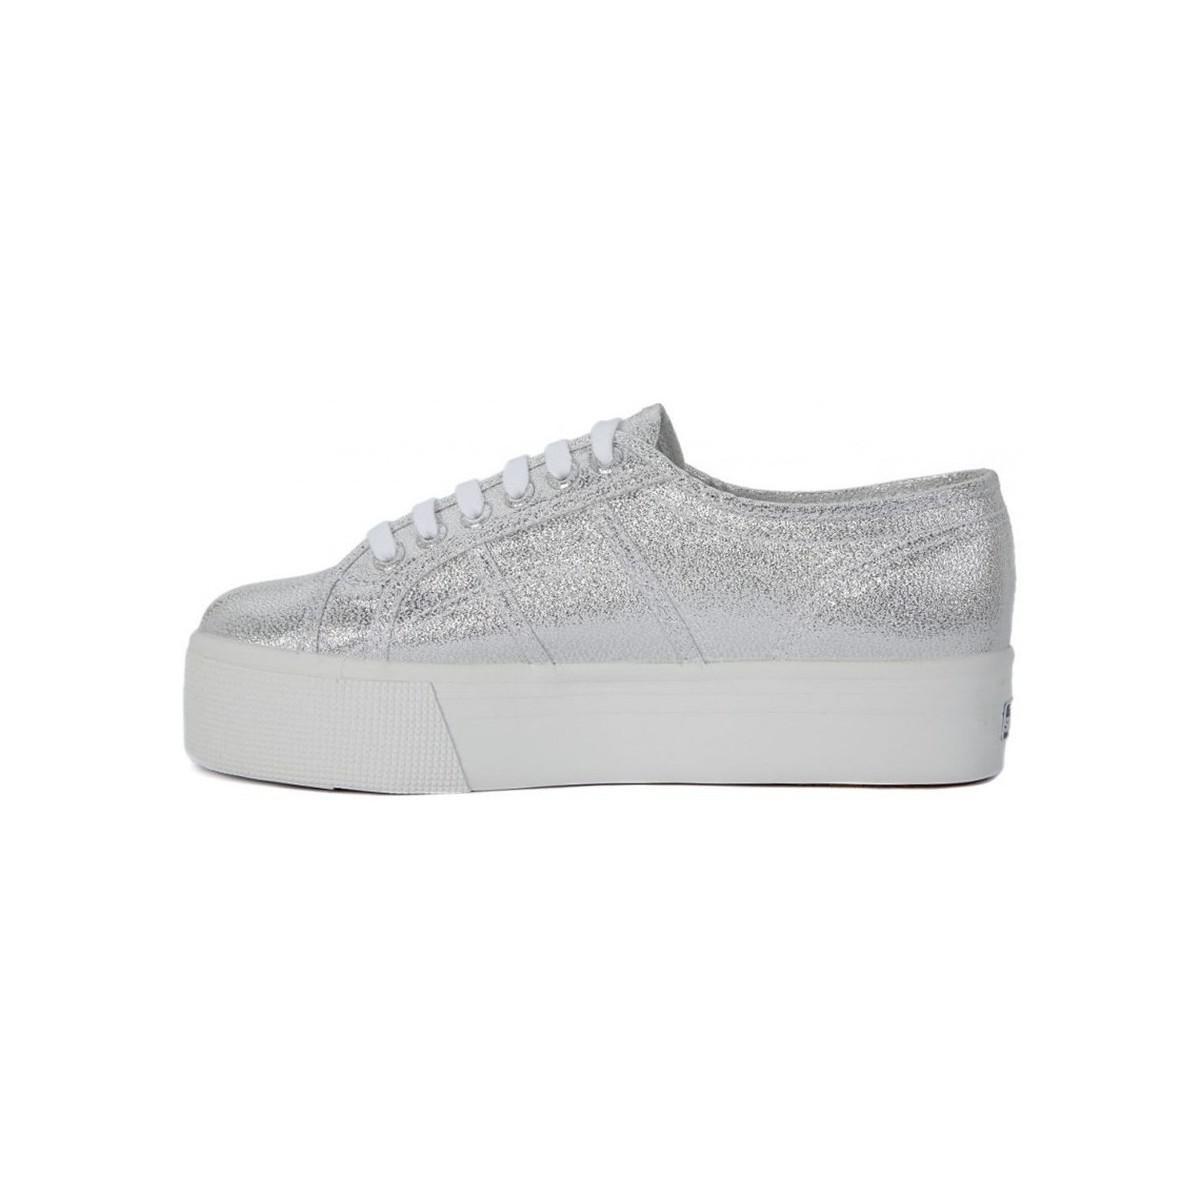 Buy Cheap Footlocker Sale Choice Superga Lame Wedge Grey women's in Websites For Sale RTMLhc